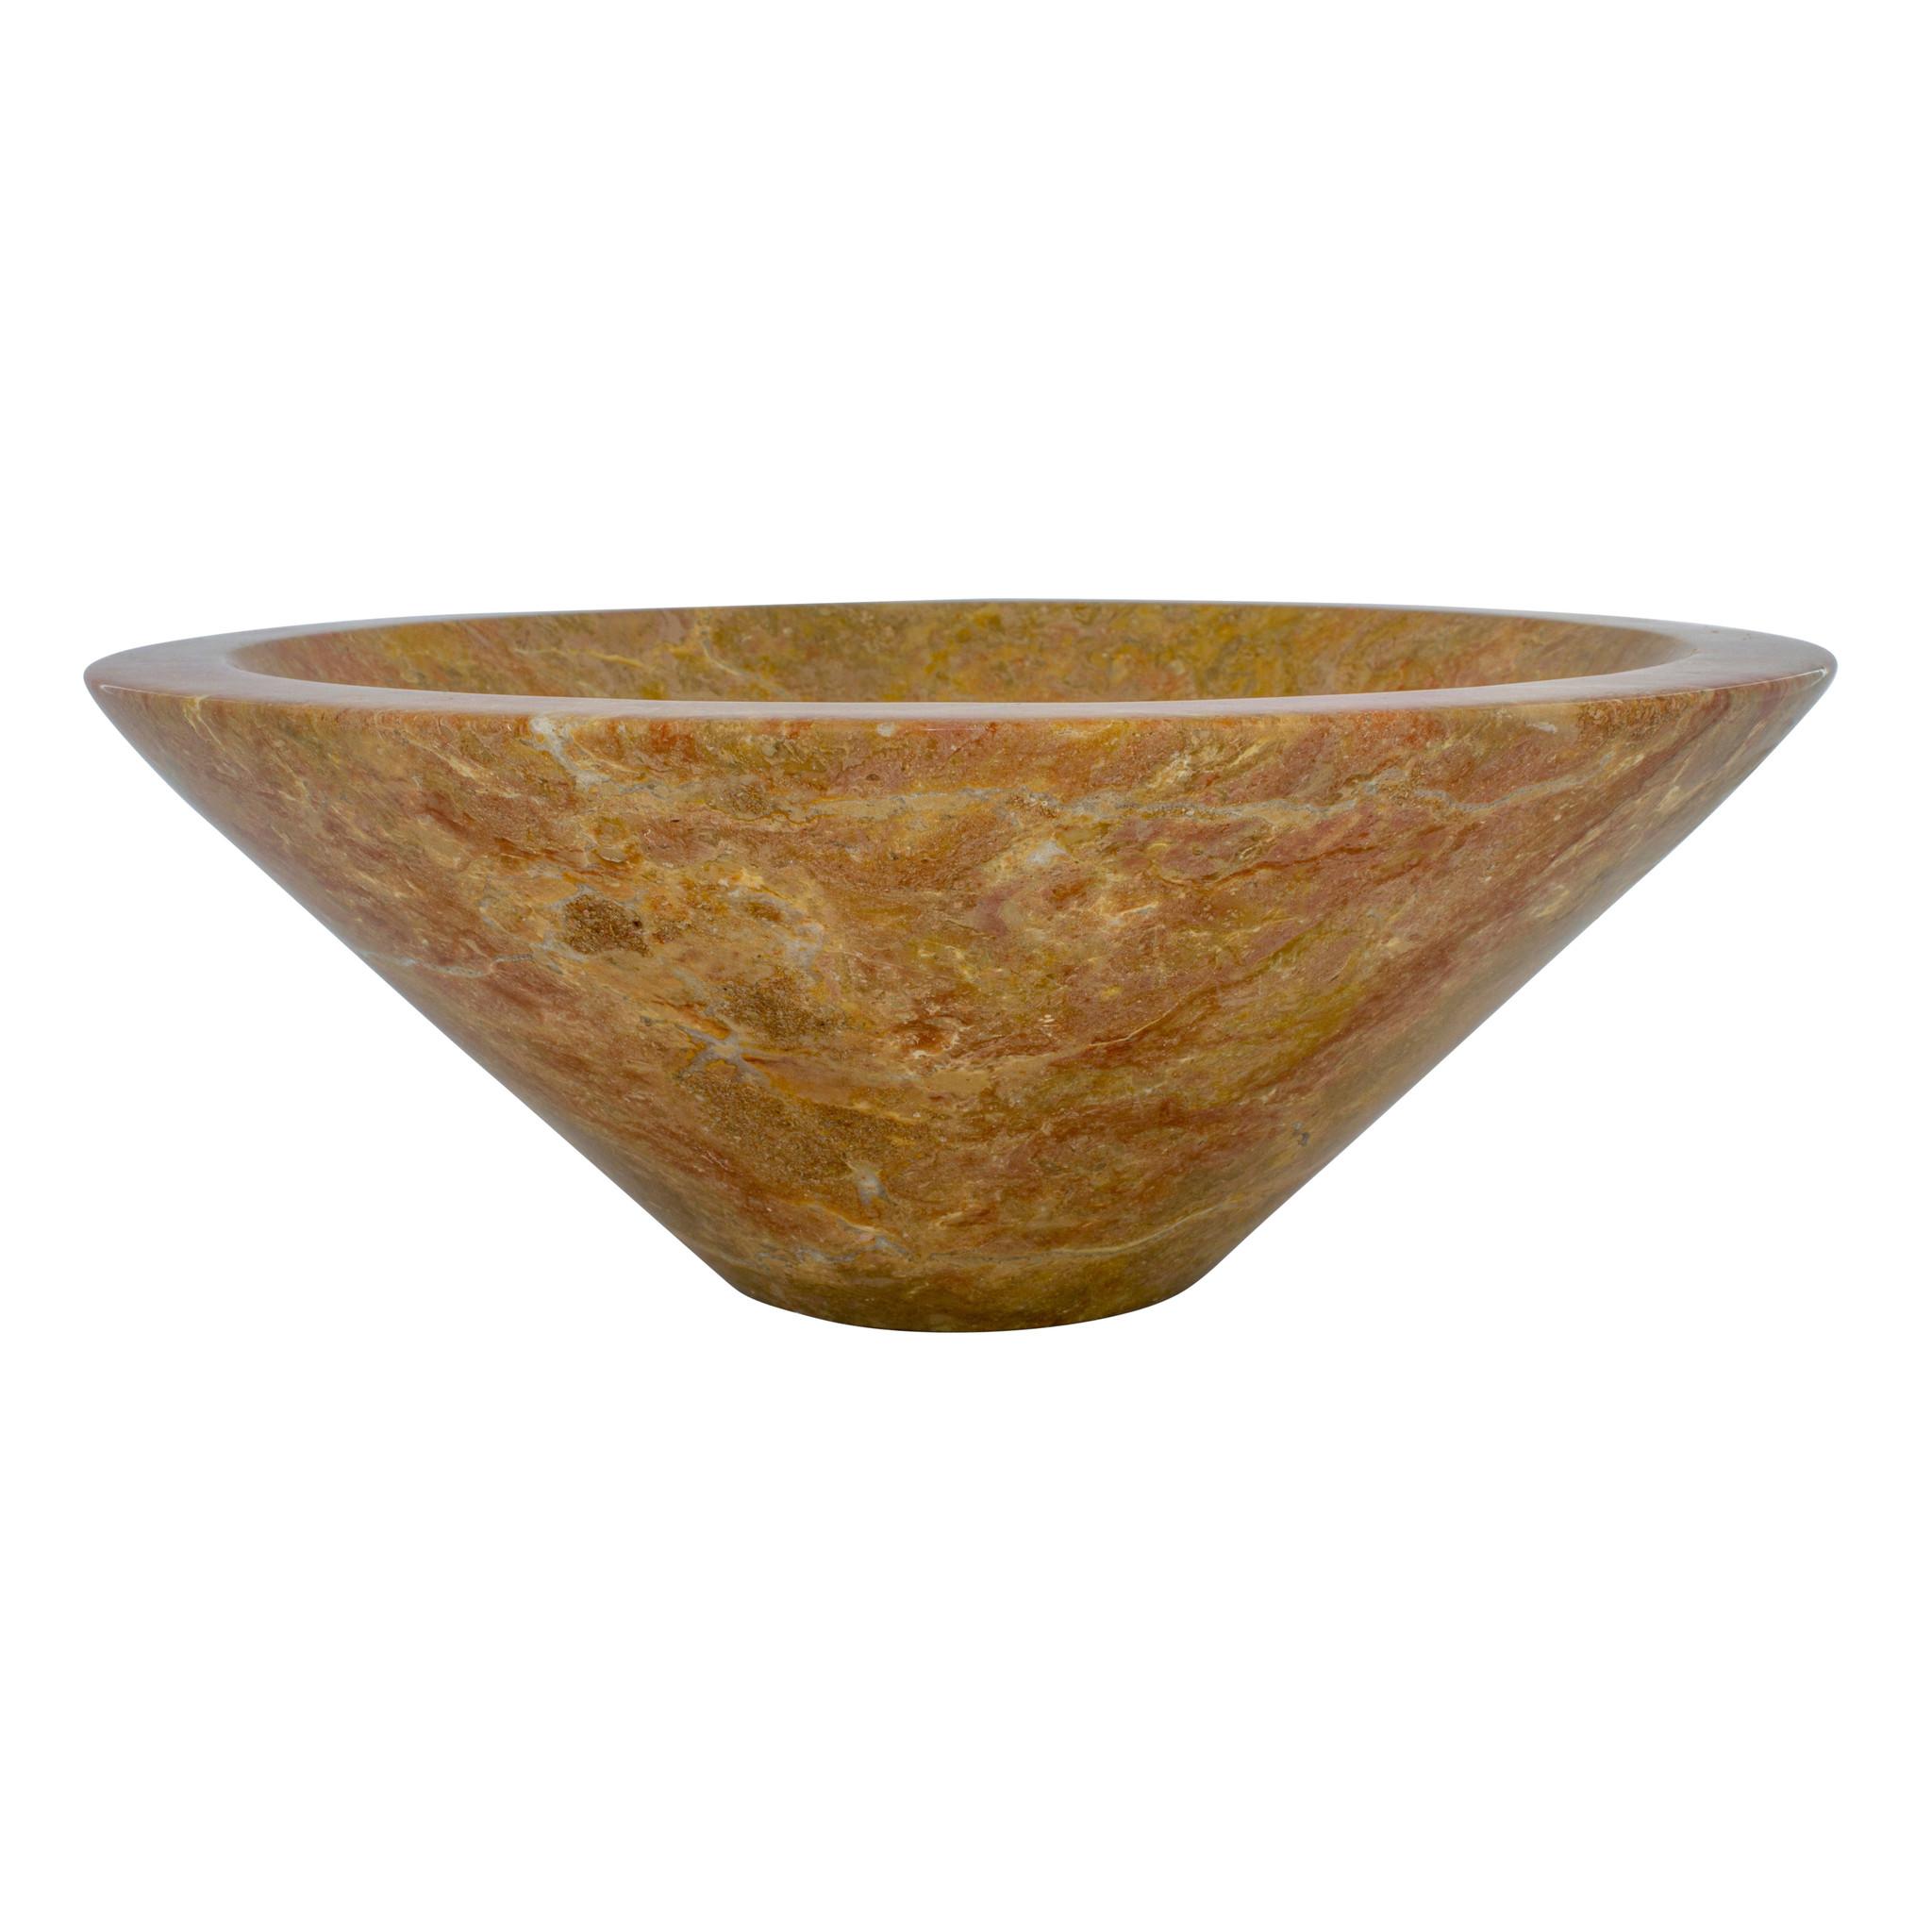 Indomarmer Red Marble Wash bowl MembraneØ 40 x H 15 cm